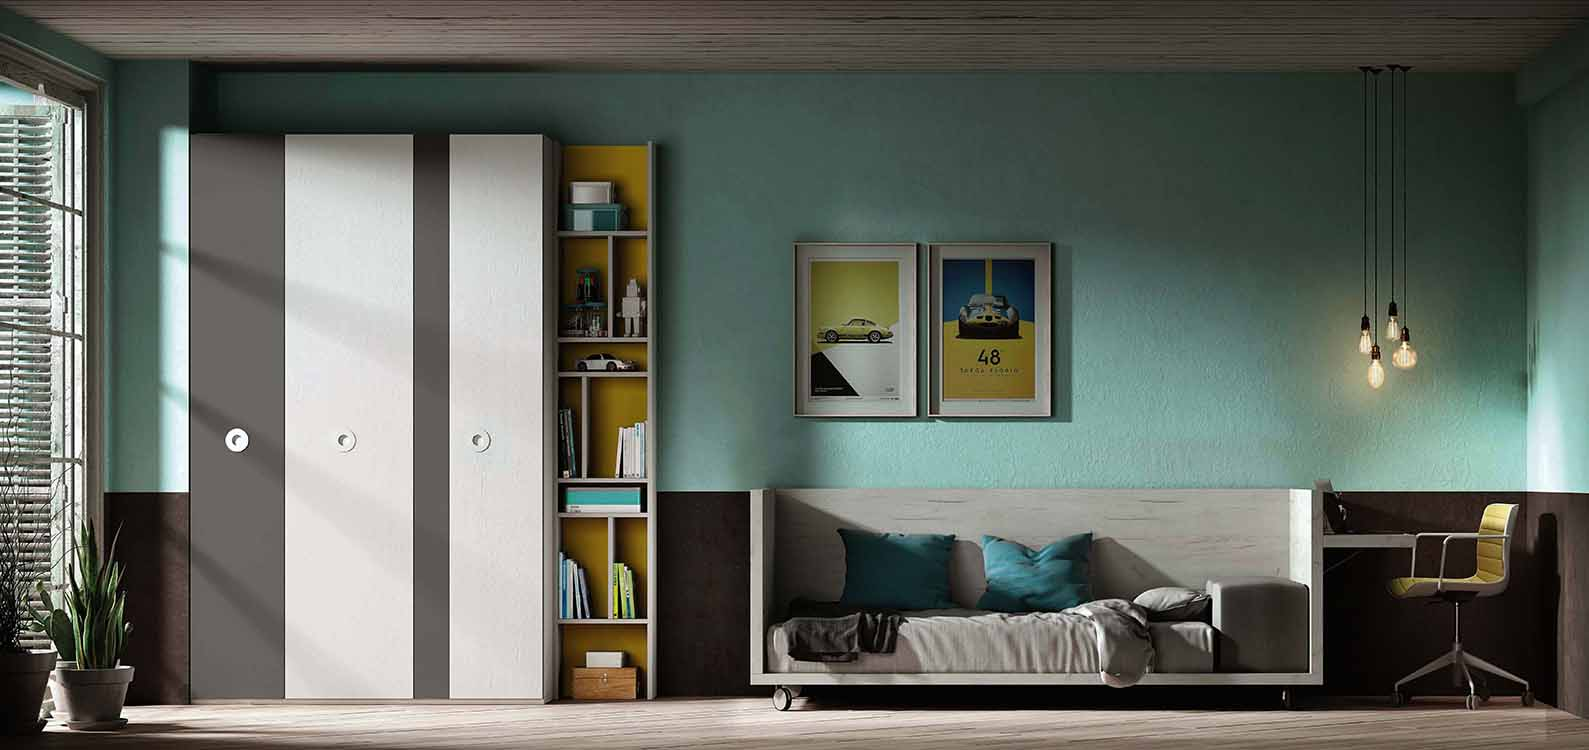 http://www.munozmuebles.net/nueva/catalogo/juveniles-modulares.html -  Establecimientos de muebles negros